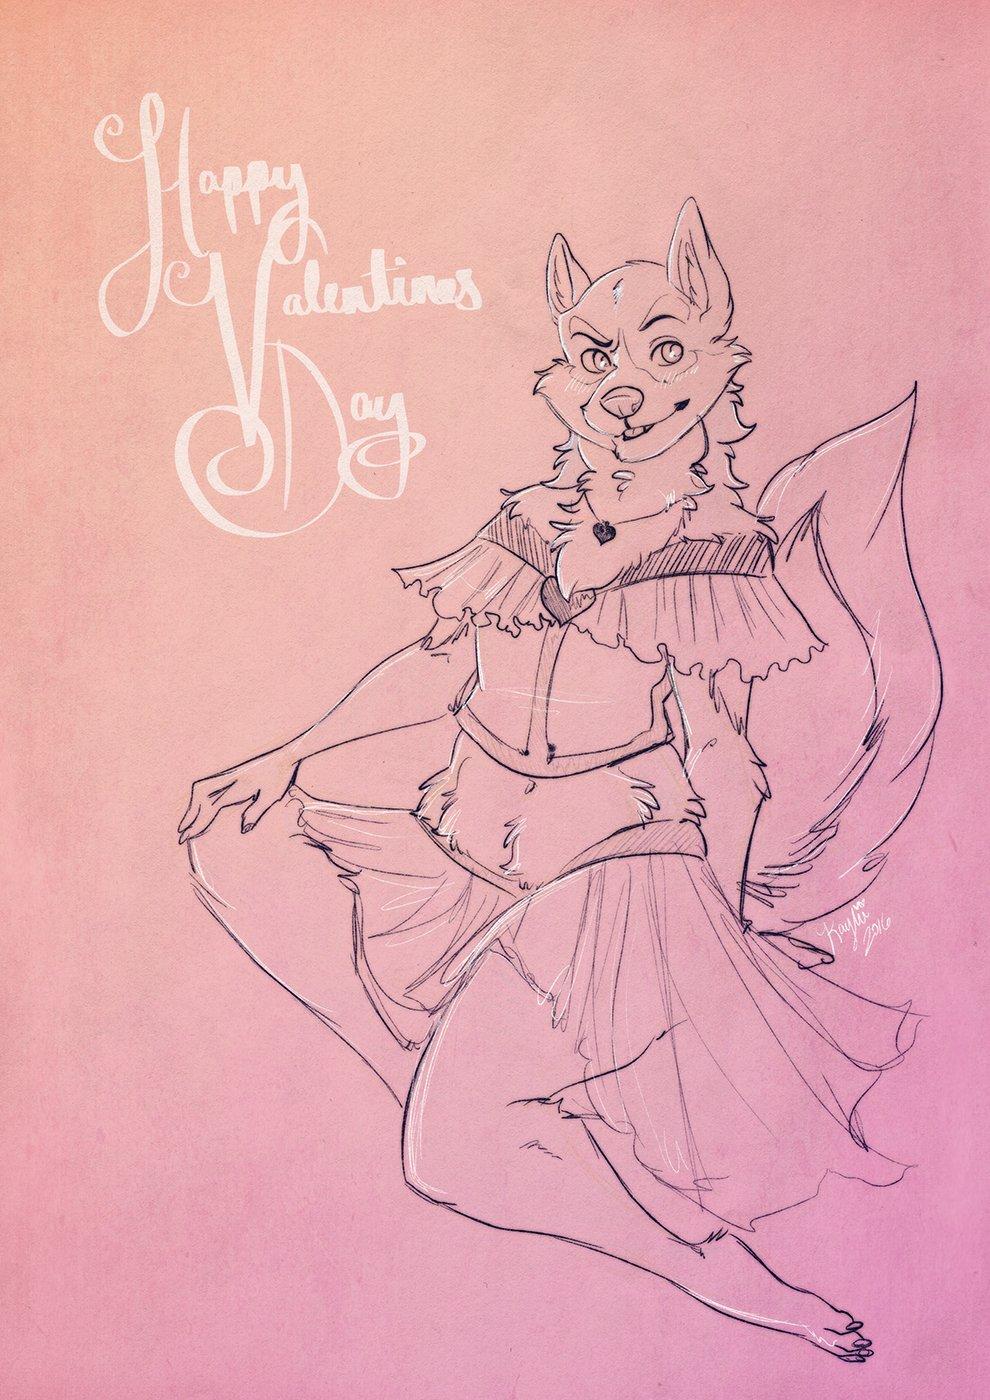 Featured image: Valentine cutie (by Kaylii)